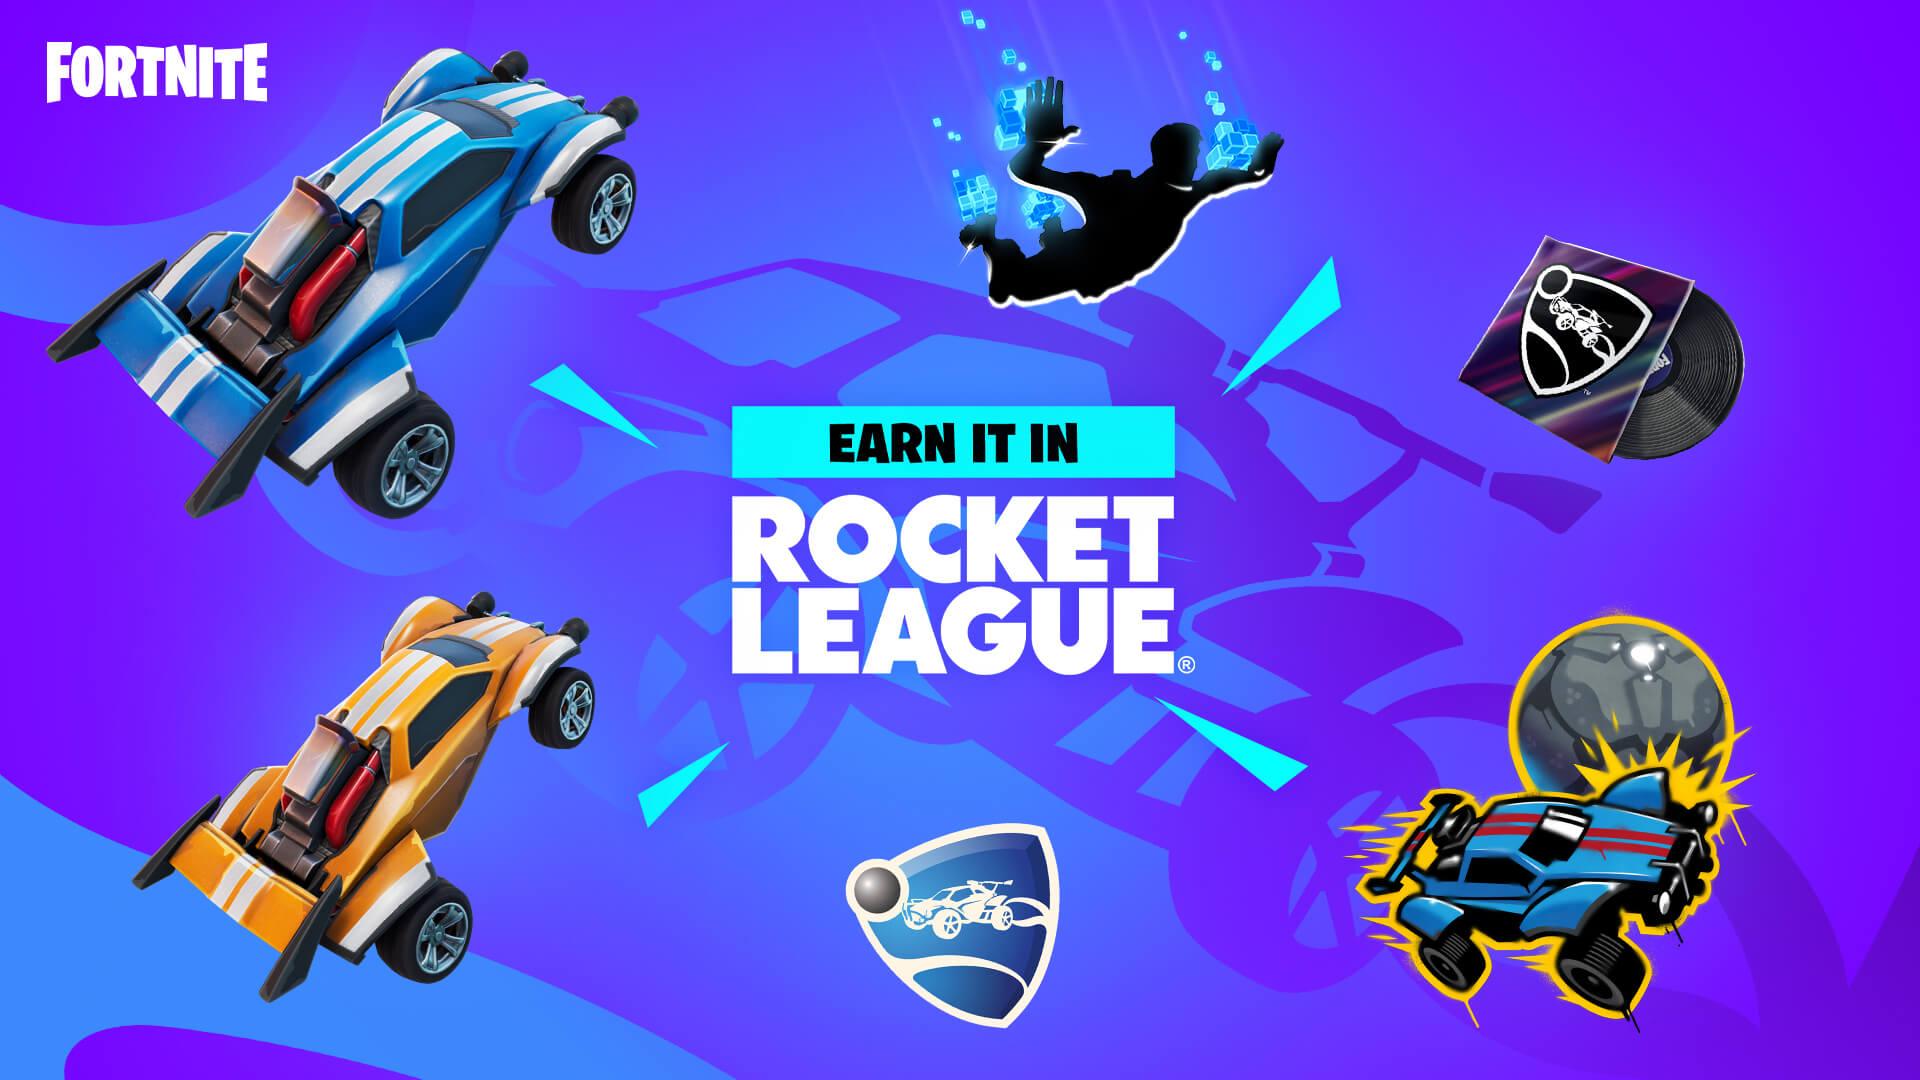 Epic Games rewards for fortnite x rocket league event